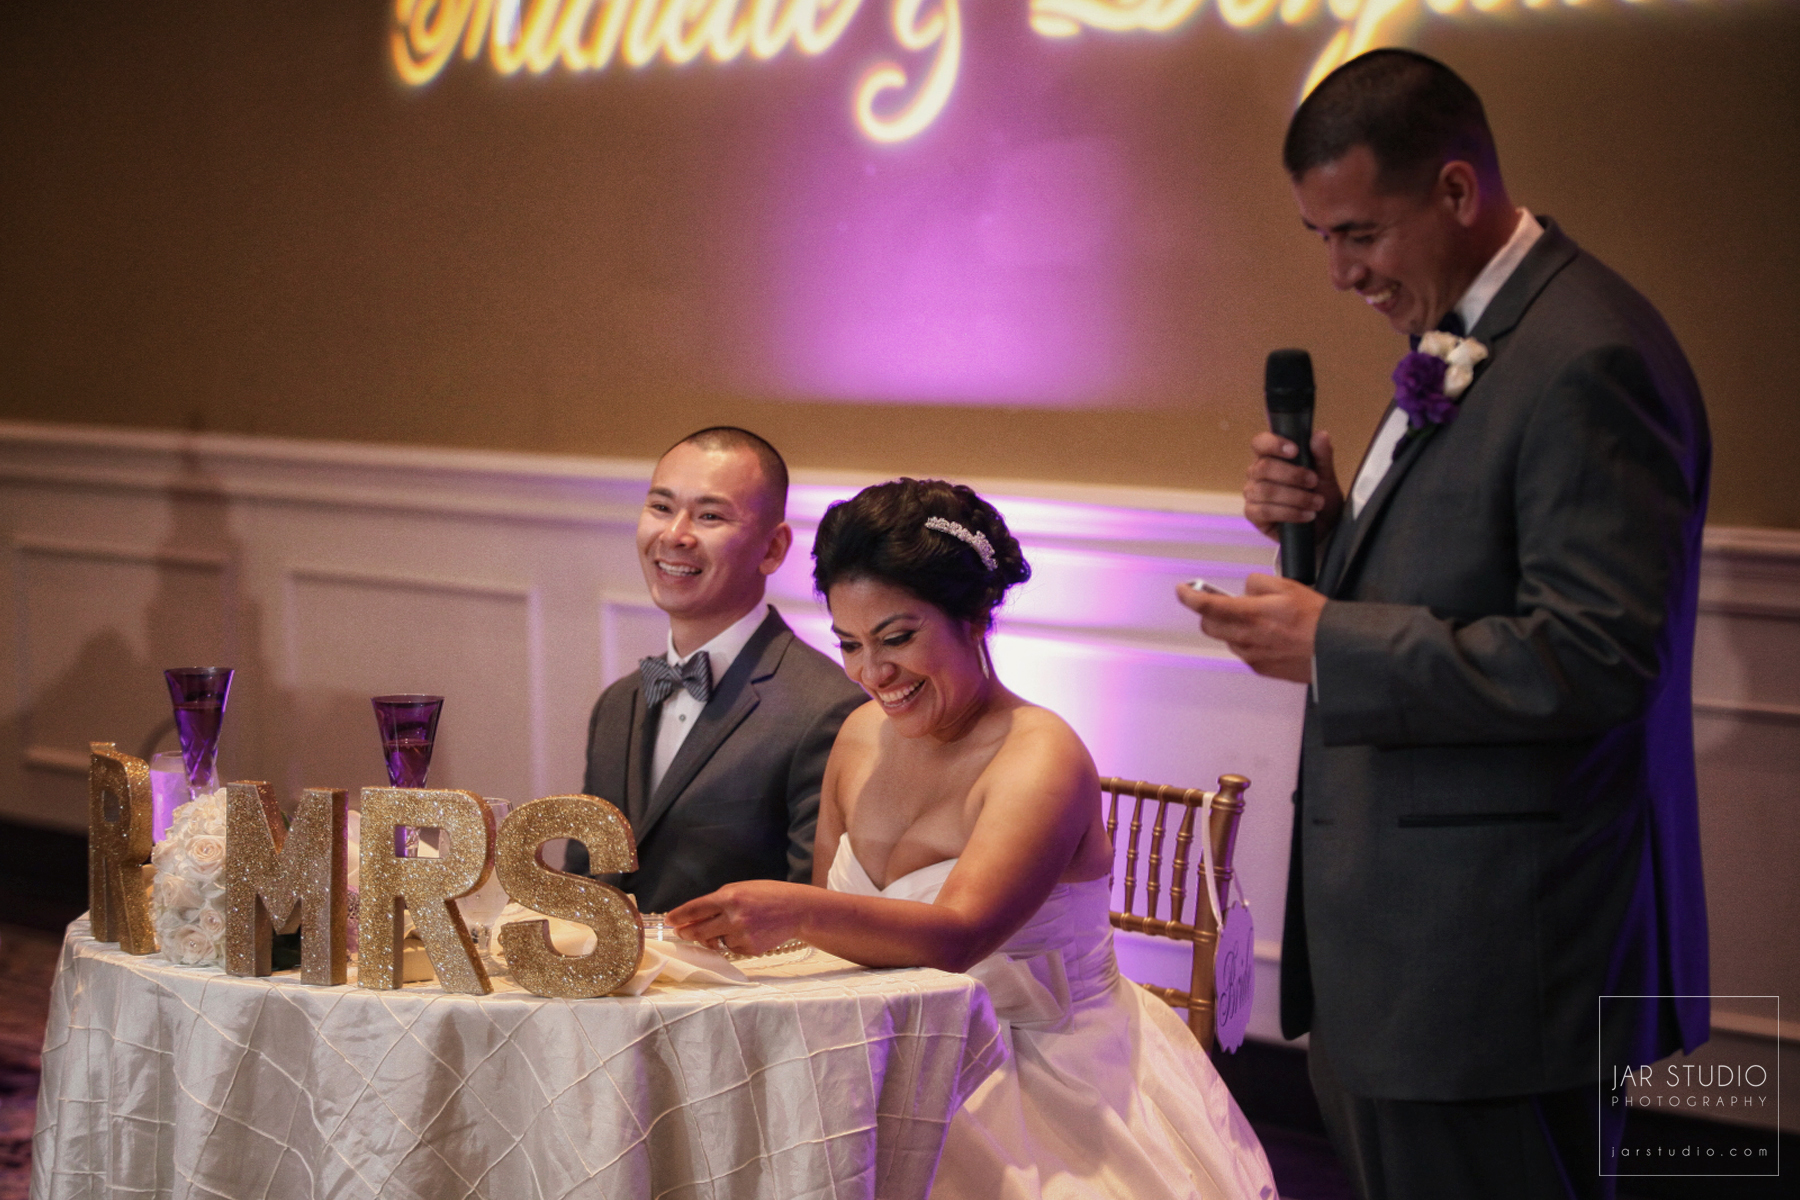 25-mr-mrs-wedding-decor-fun-beautiful-jarstudio-photography.JPG